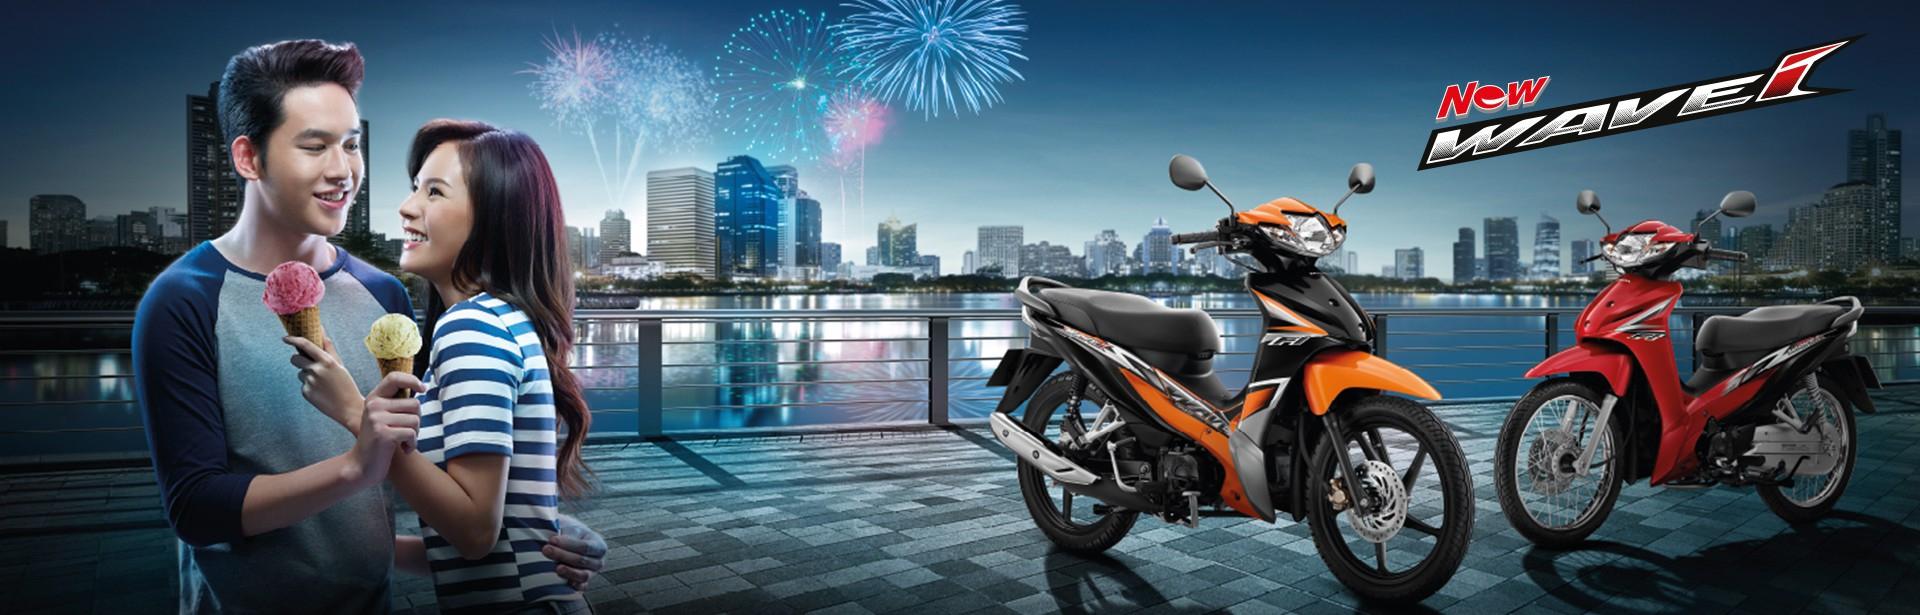 Honda-Motorcycle-มอเตอร์ไซค์-ฮอนด้า-Wave-110i-2017